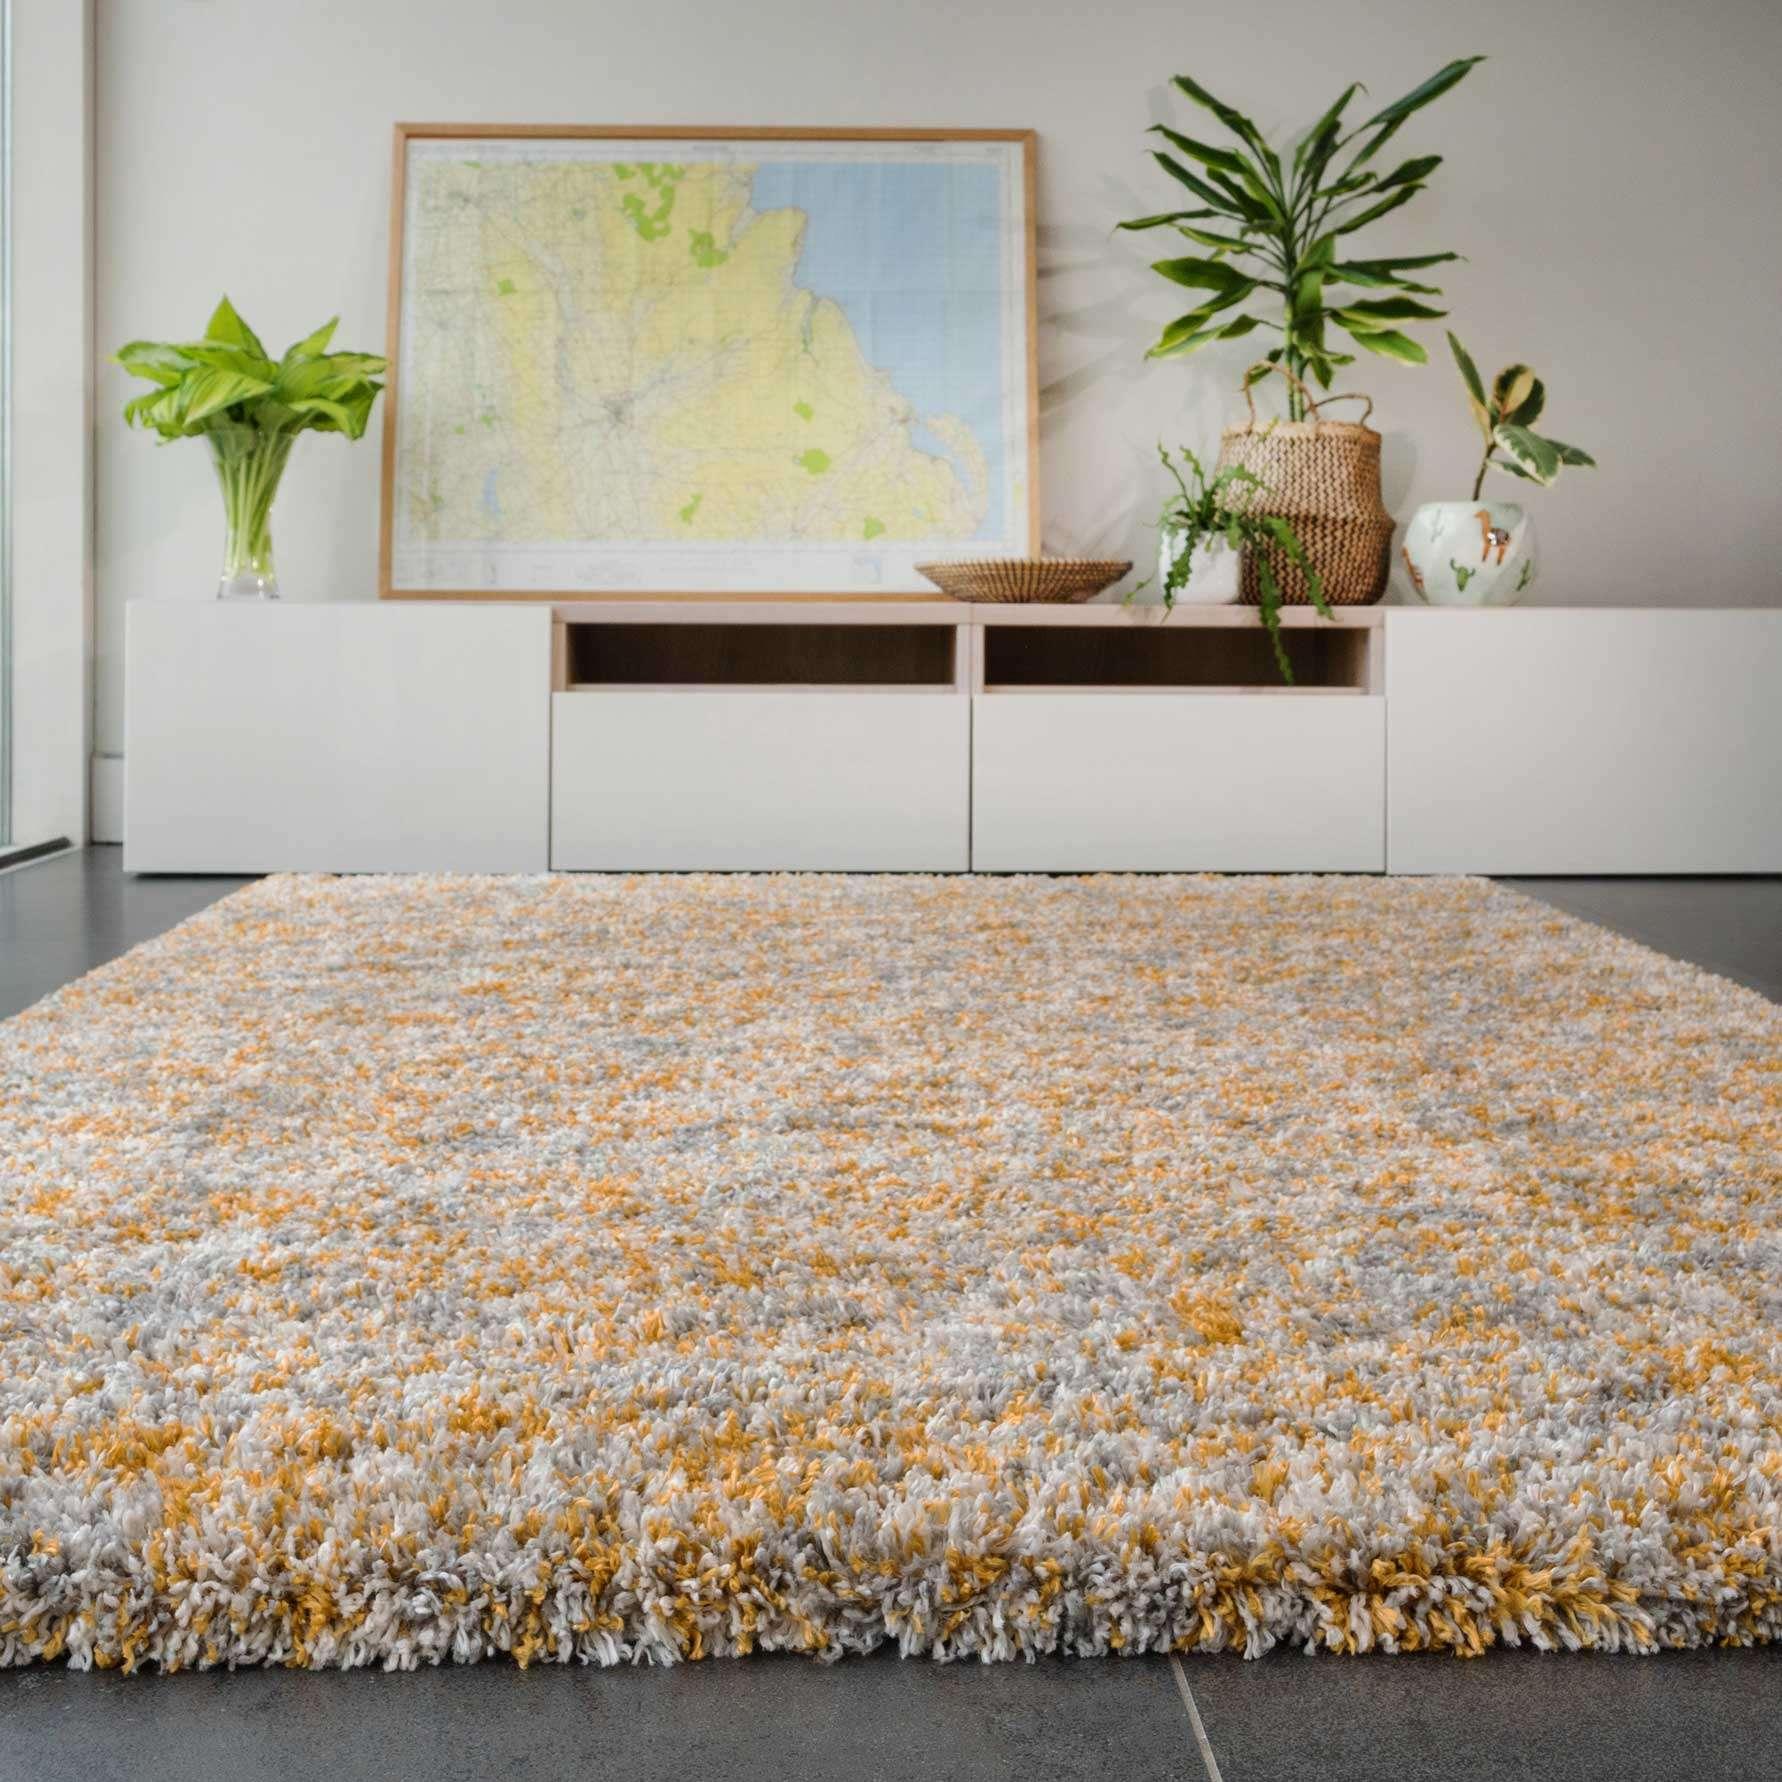 Soft Mottled Gold Grey Shaggy Area Rug | Camberley